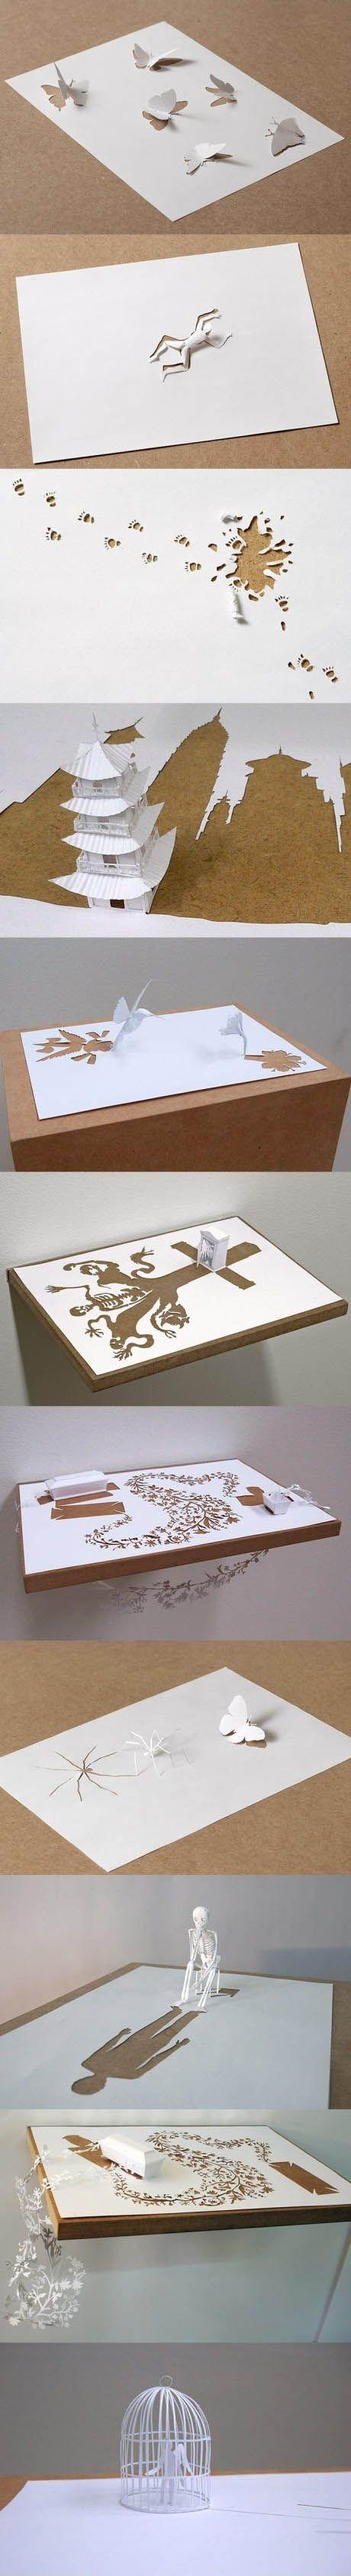 Paper art. So amazing.